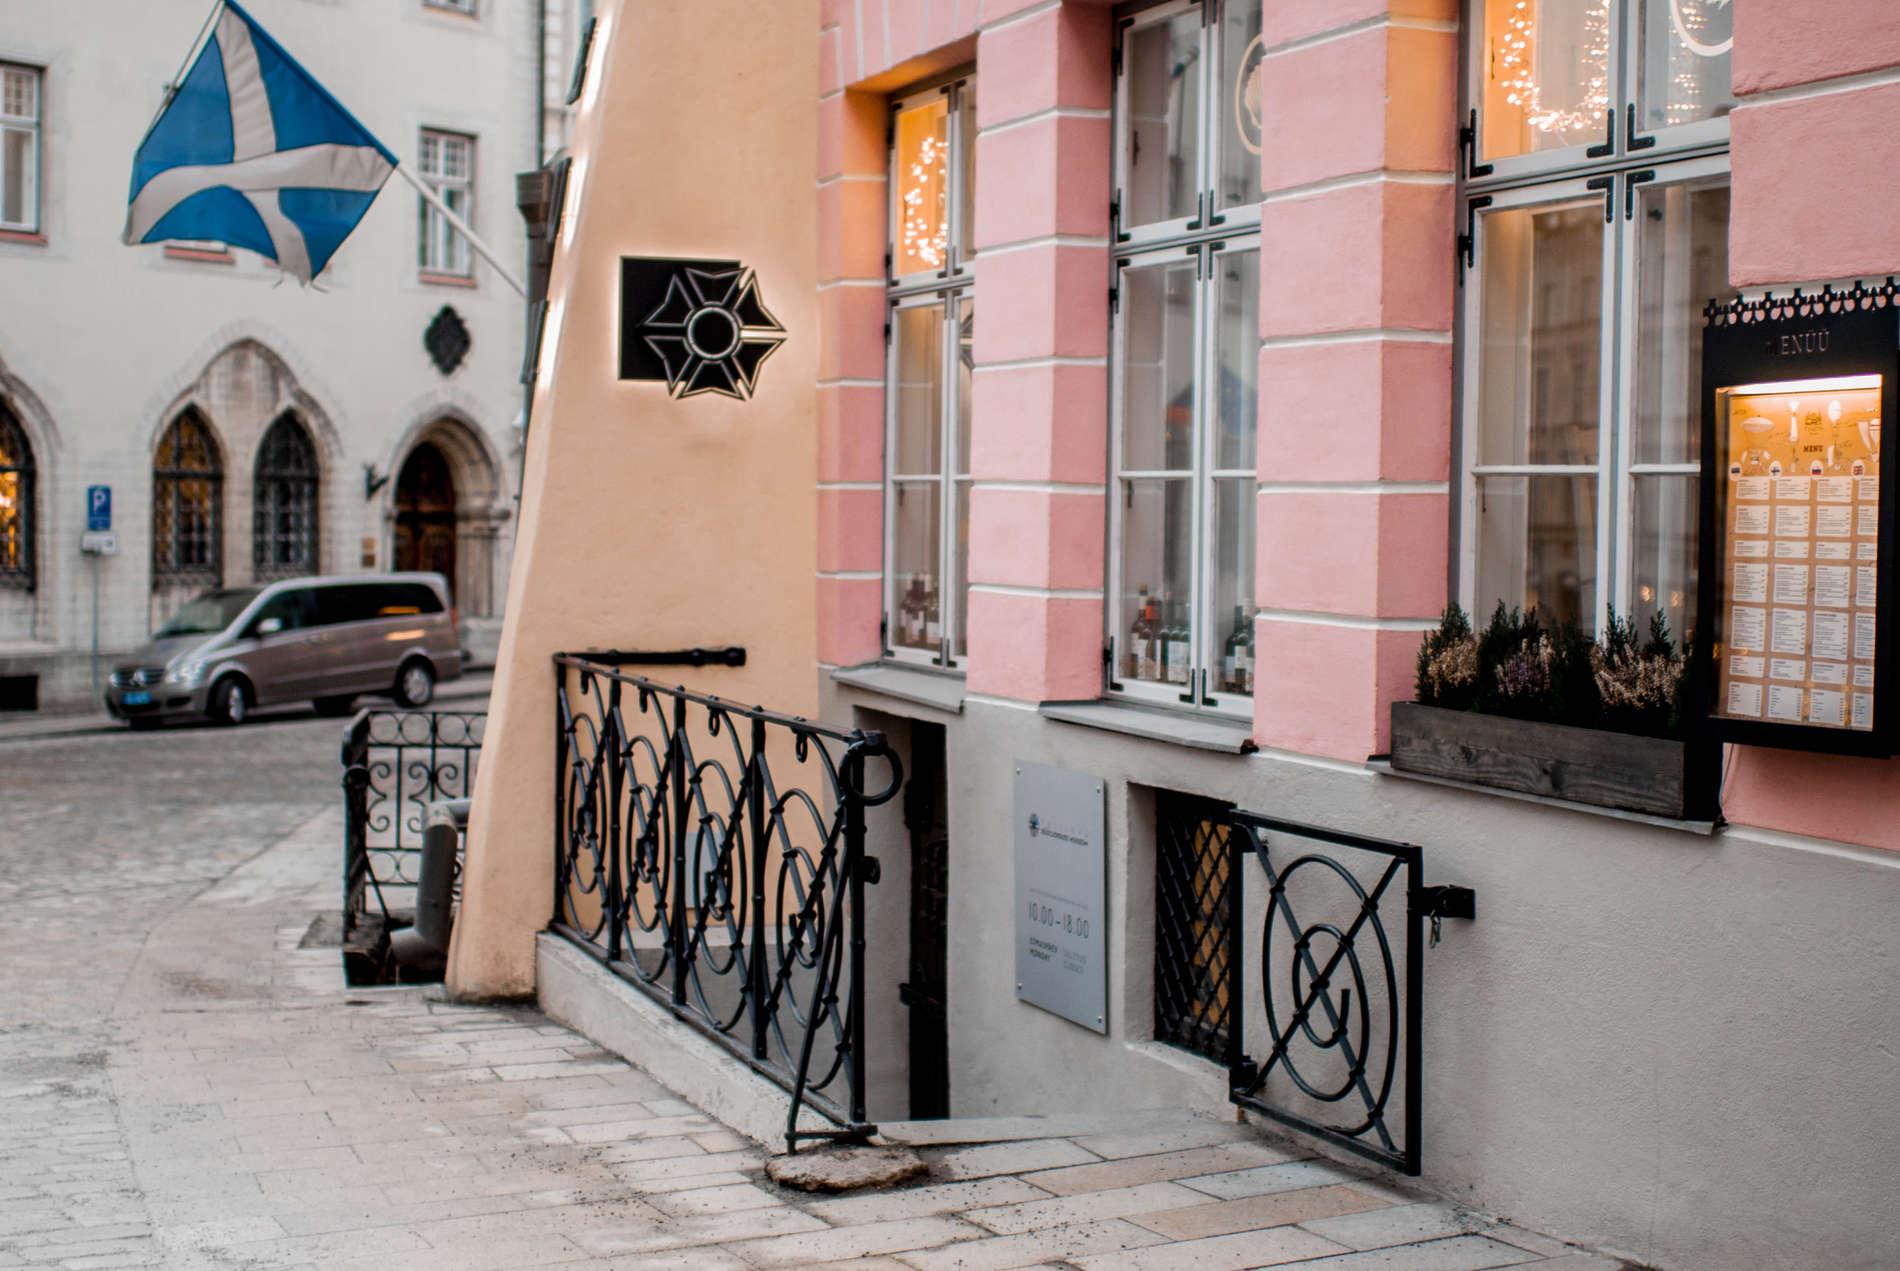 Tallinn Museum of Orders of Knighthood in Tallinn, Estonia